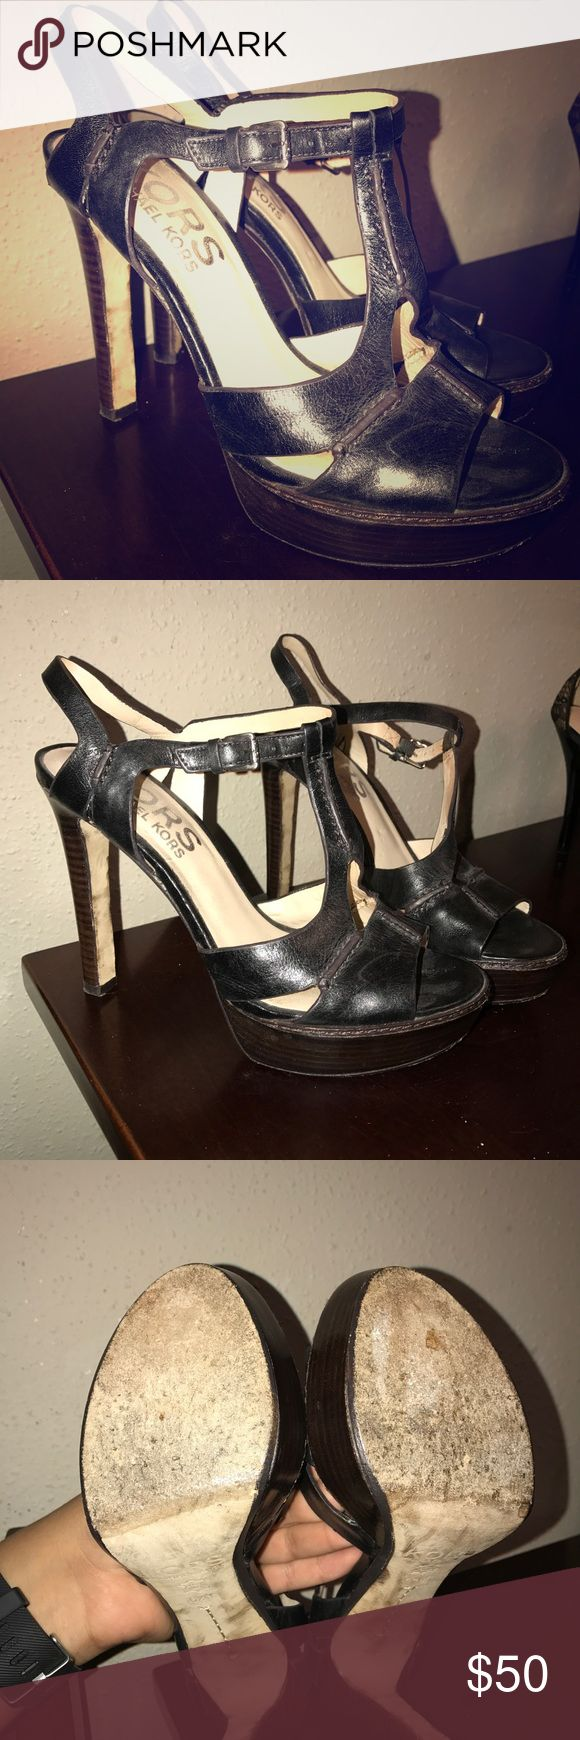 Kors Michael Kors Heels 6 1/2 Black high heel with dark brown platform KORS Michael Kors Shoes Heels